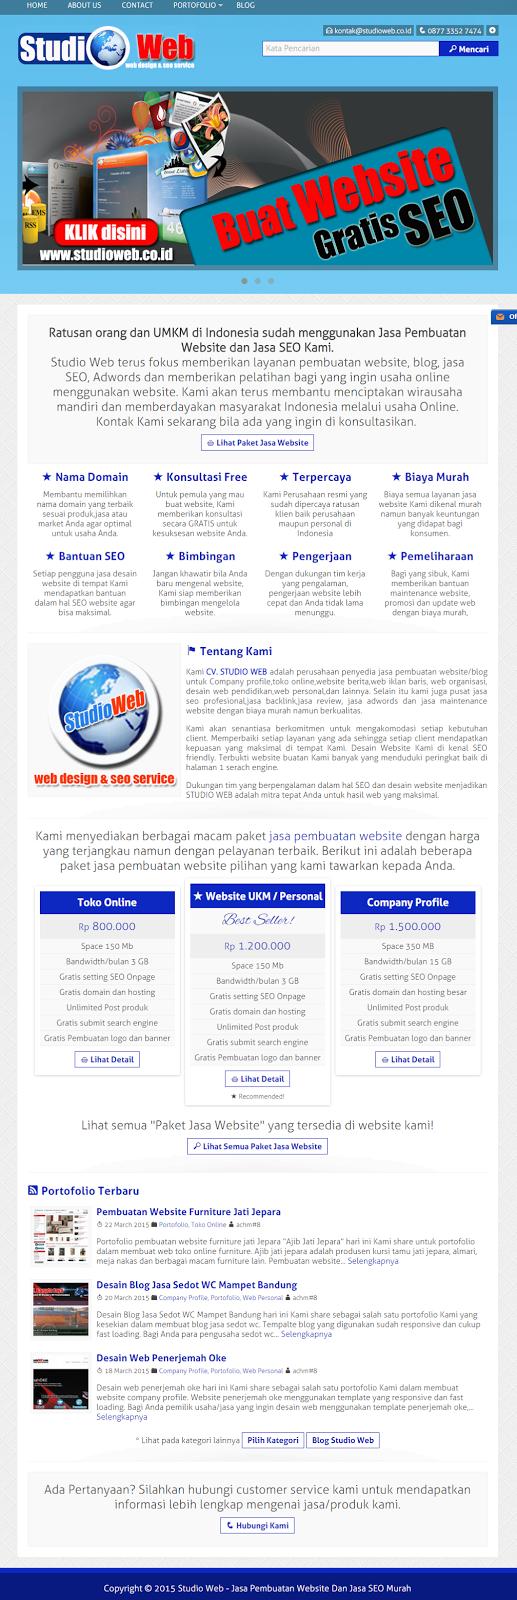 Website Baru Saya